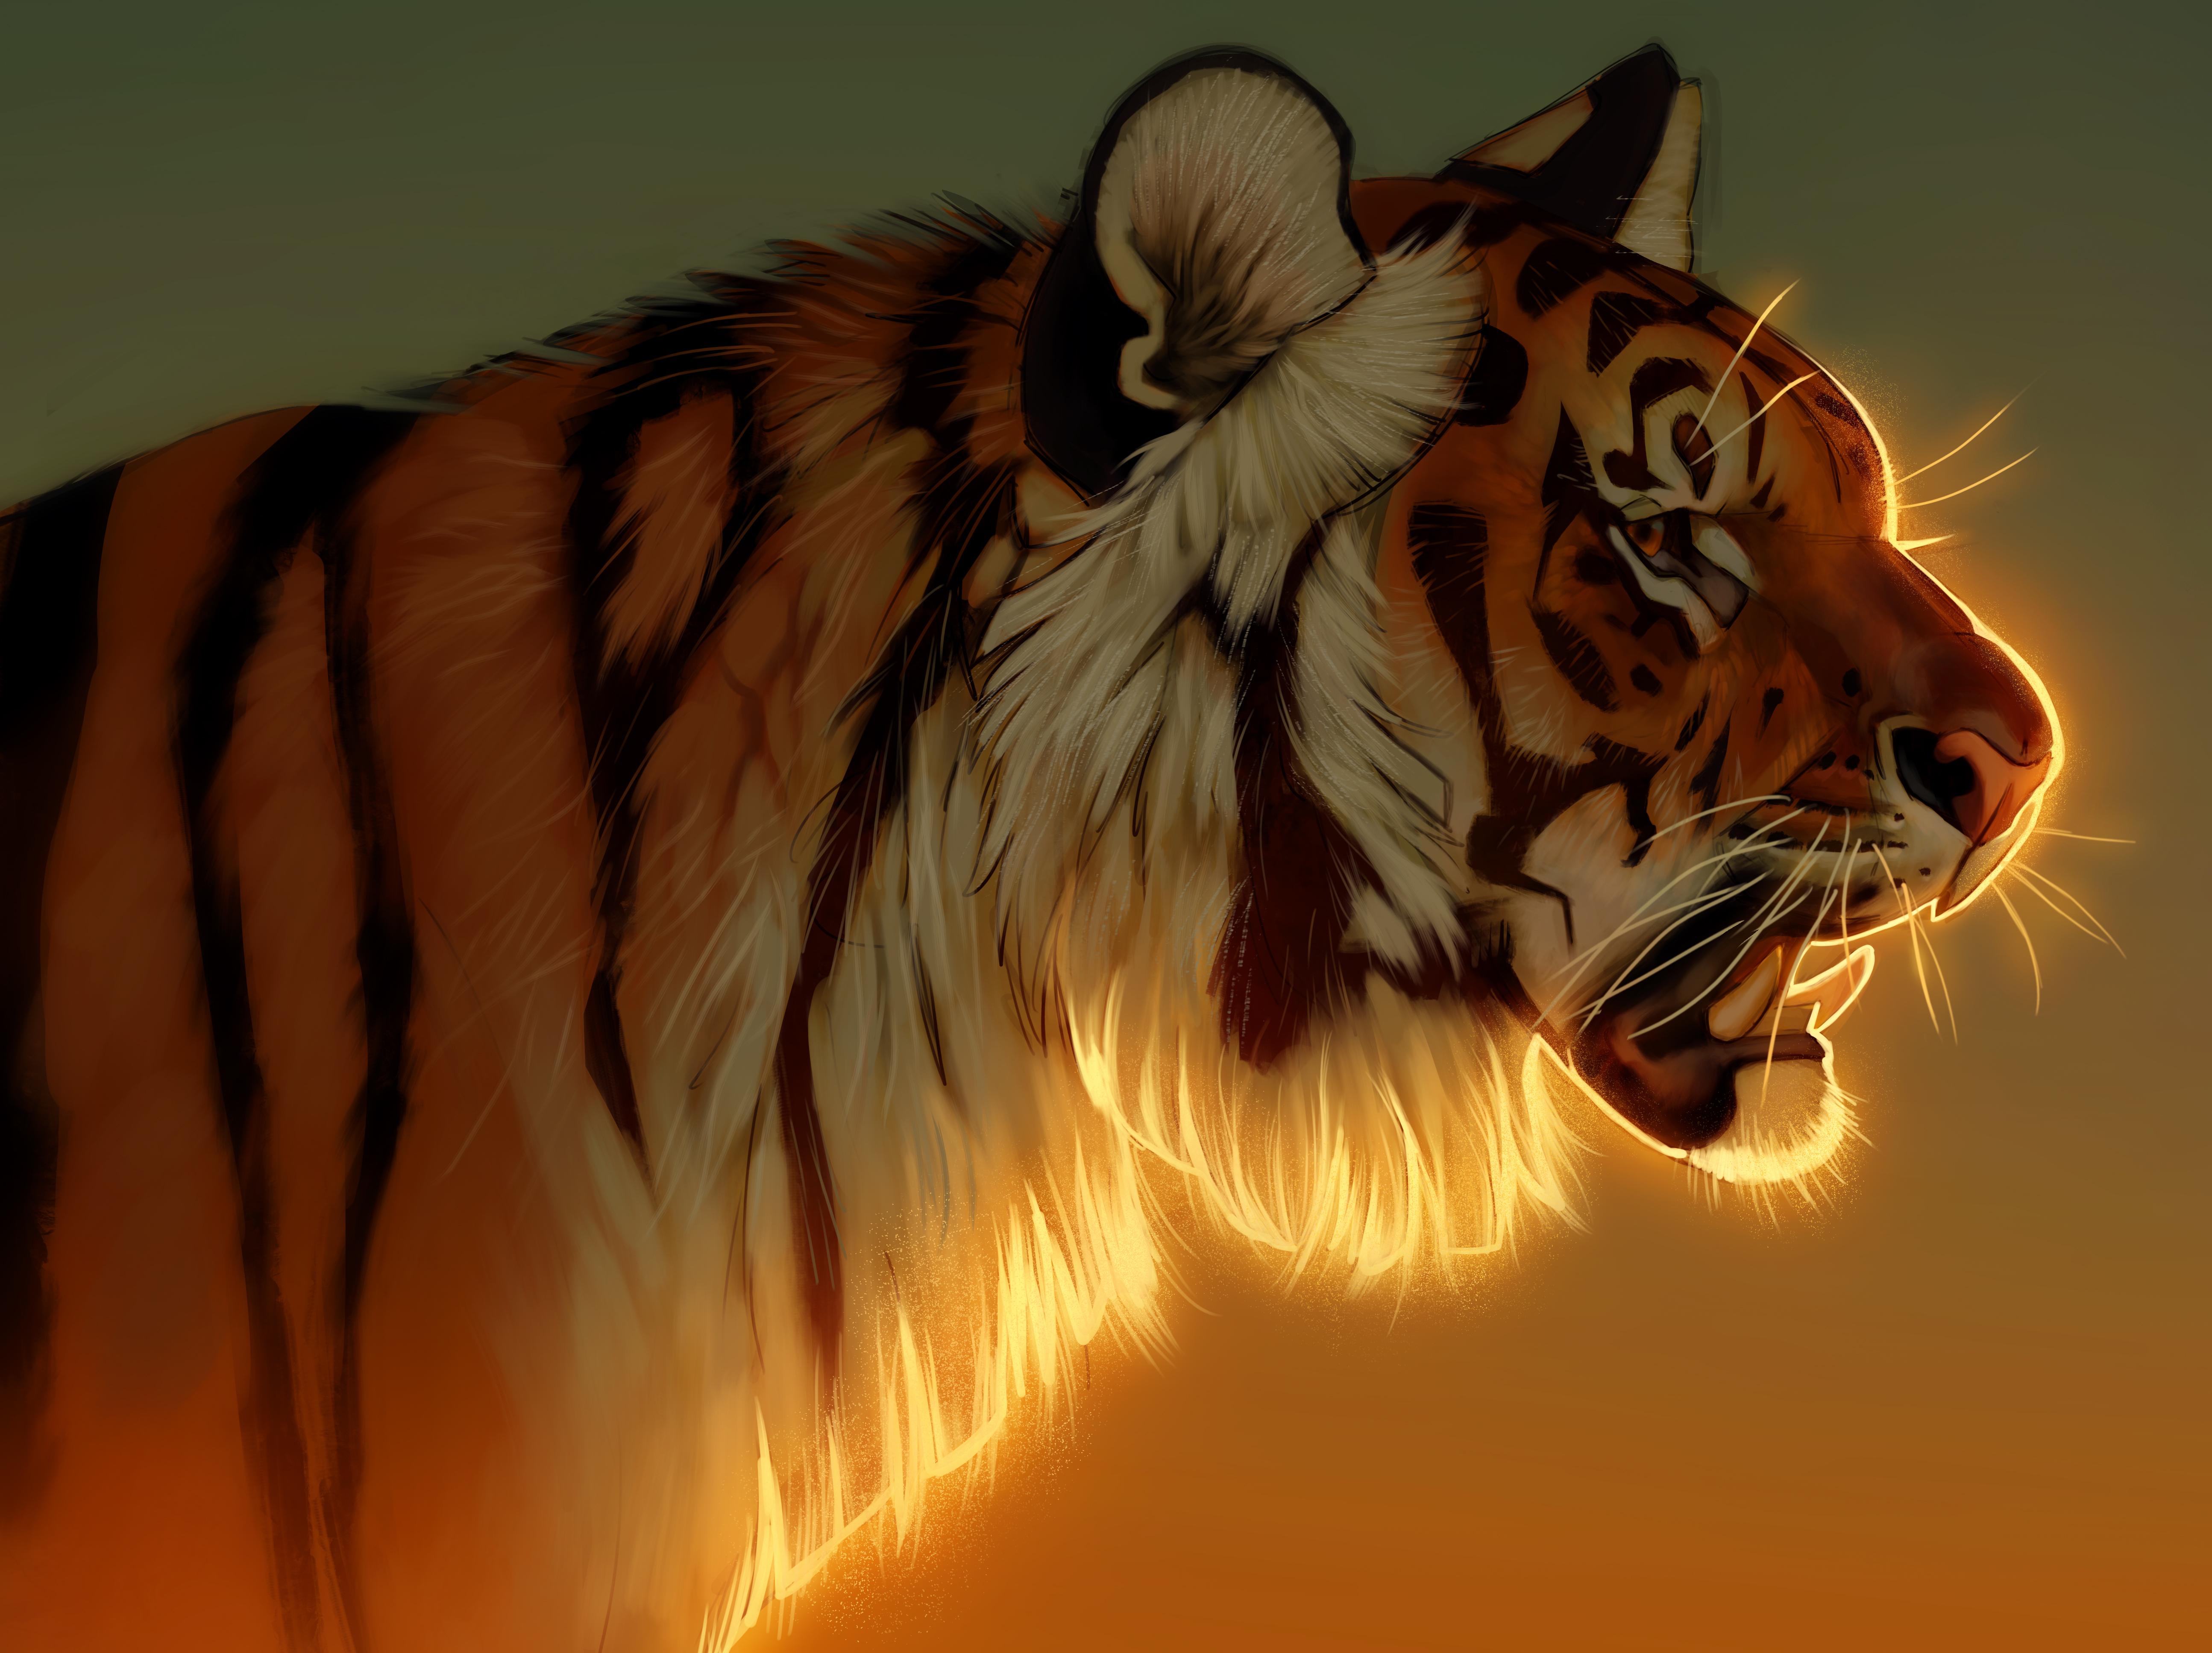 tiger evening glow 1574937965 - Tiger Evening Glow -